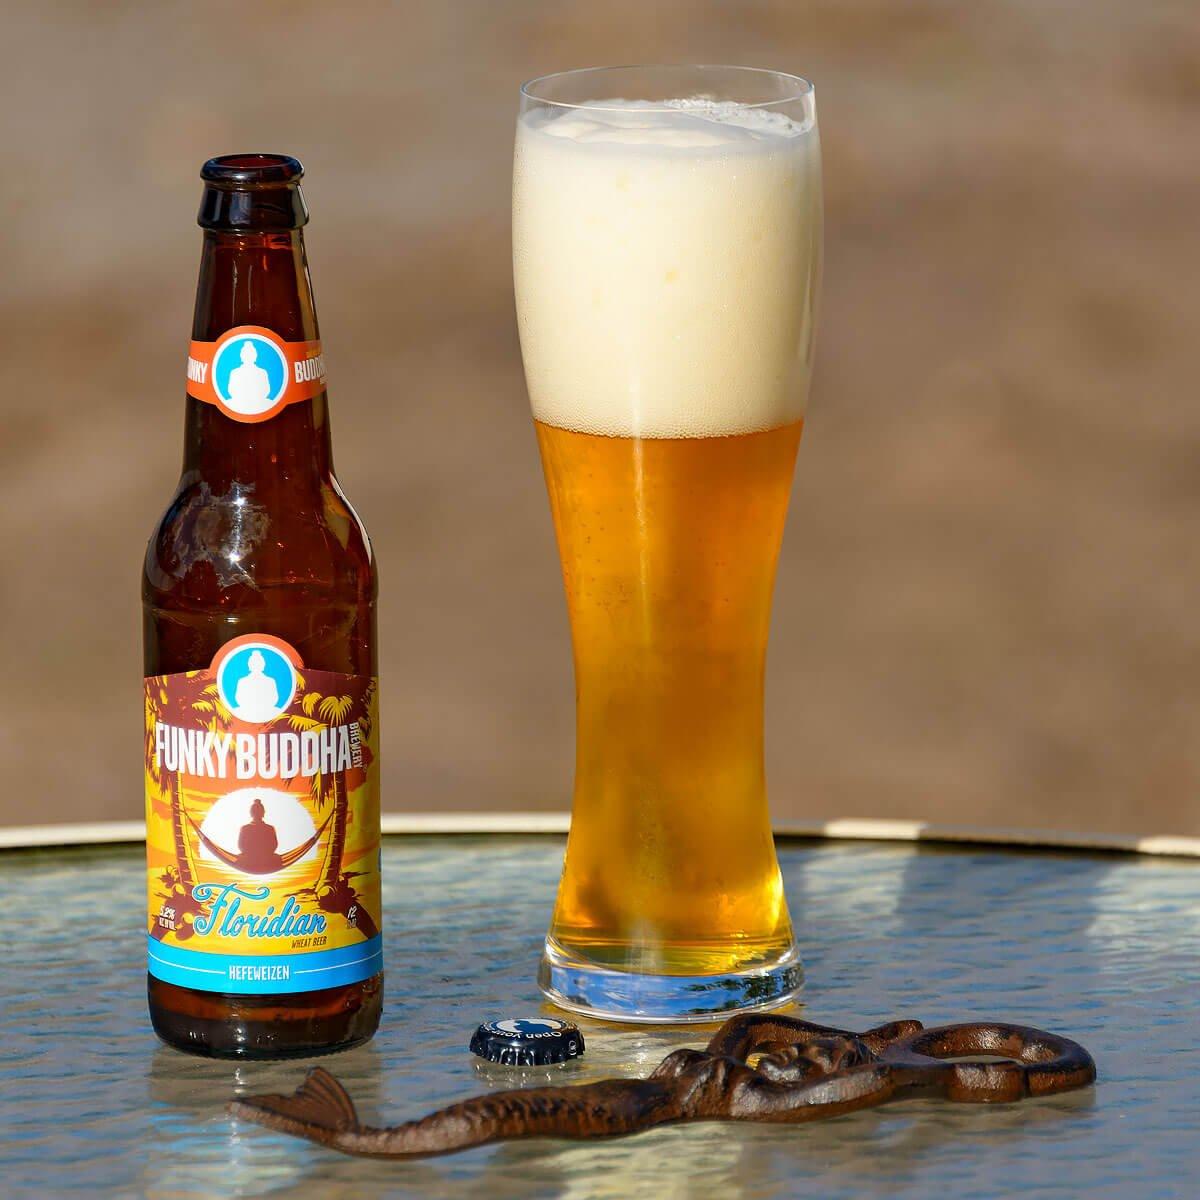 Floridian Hefeweizen, a German-style Hefeweizen by Funky Buddha Brewery